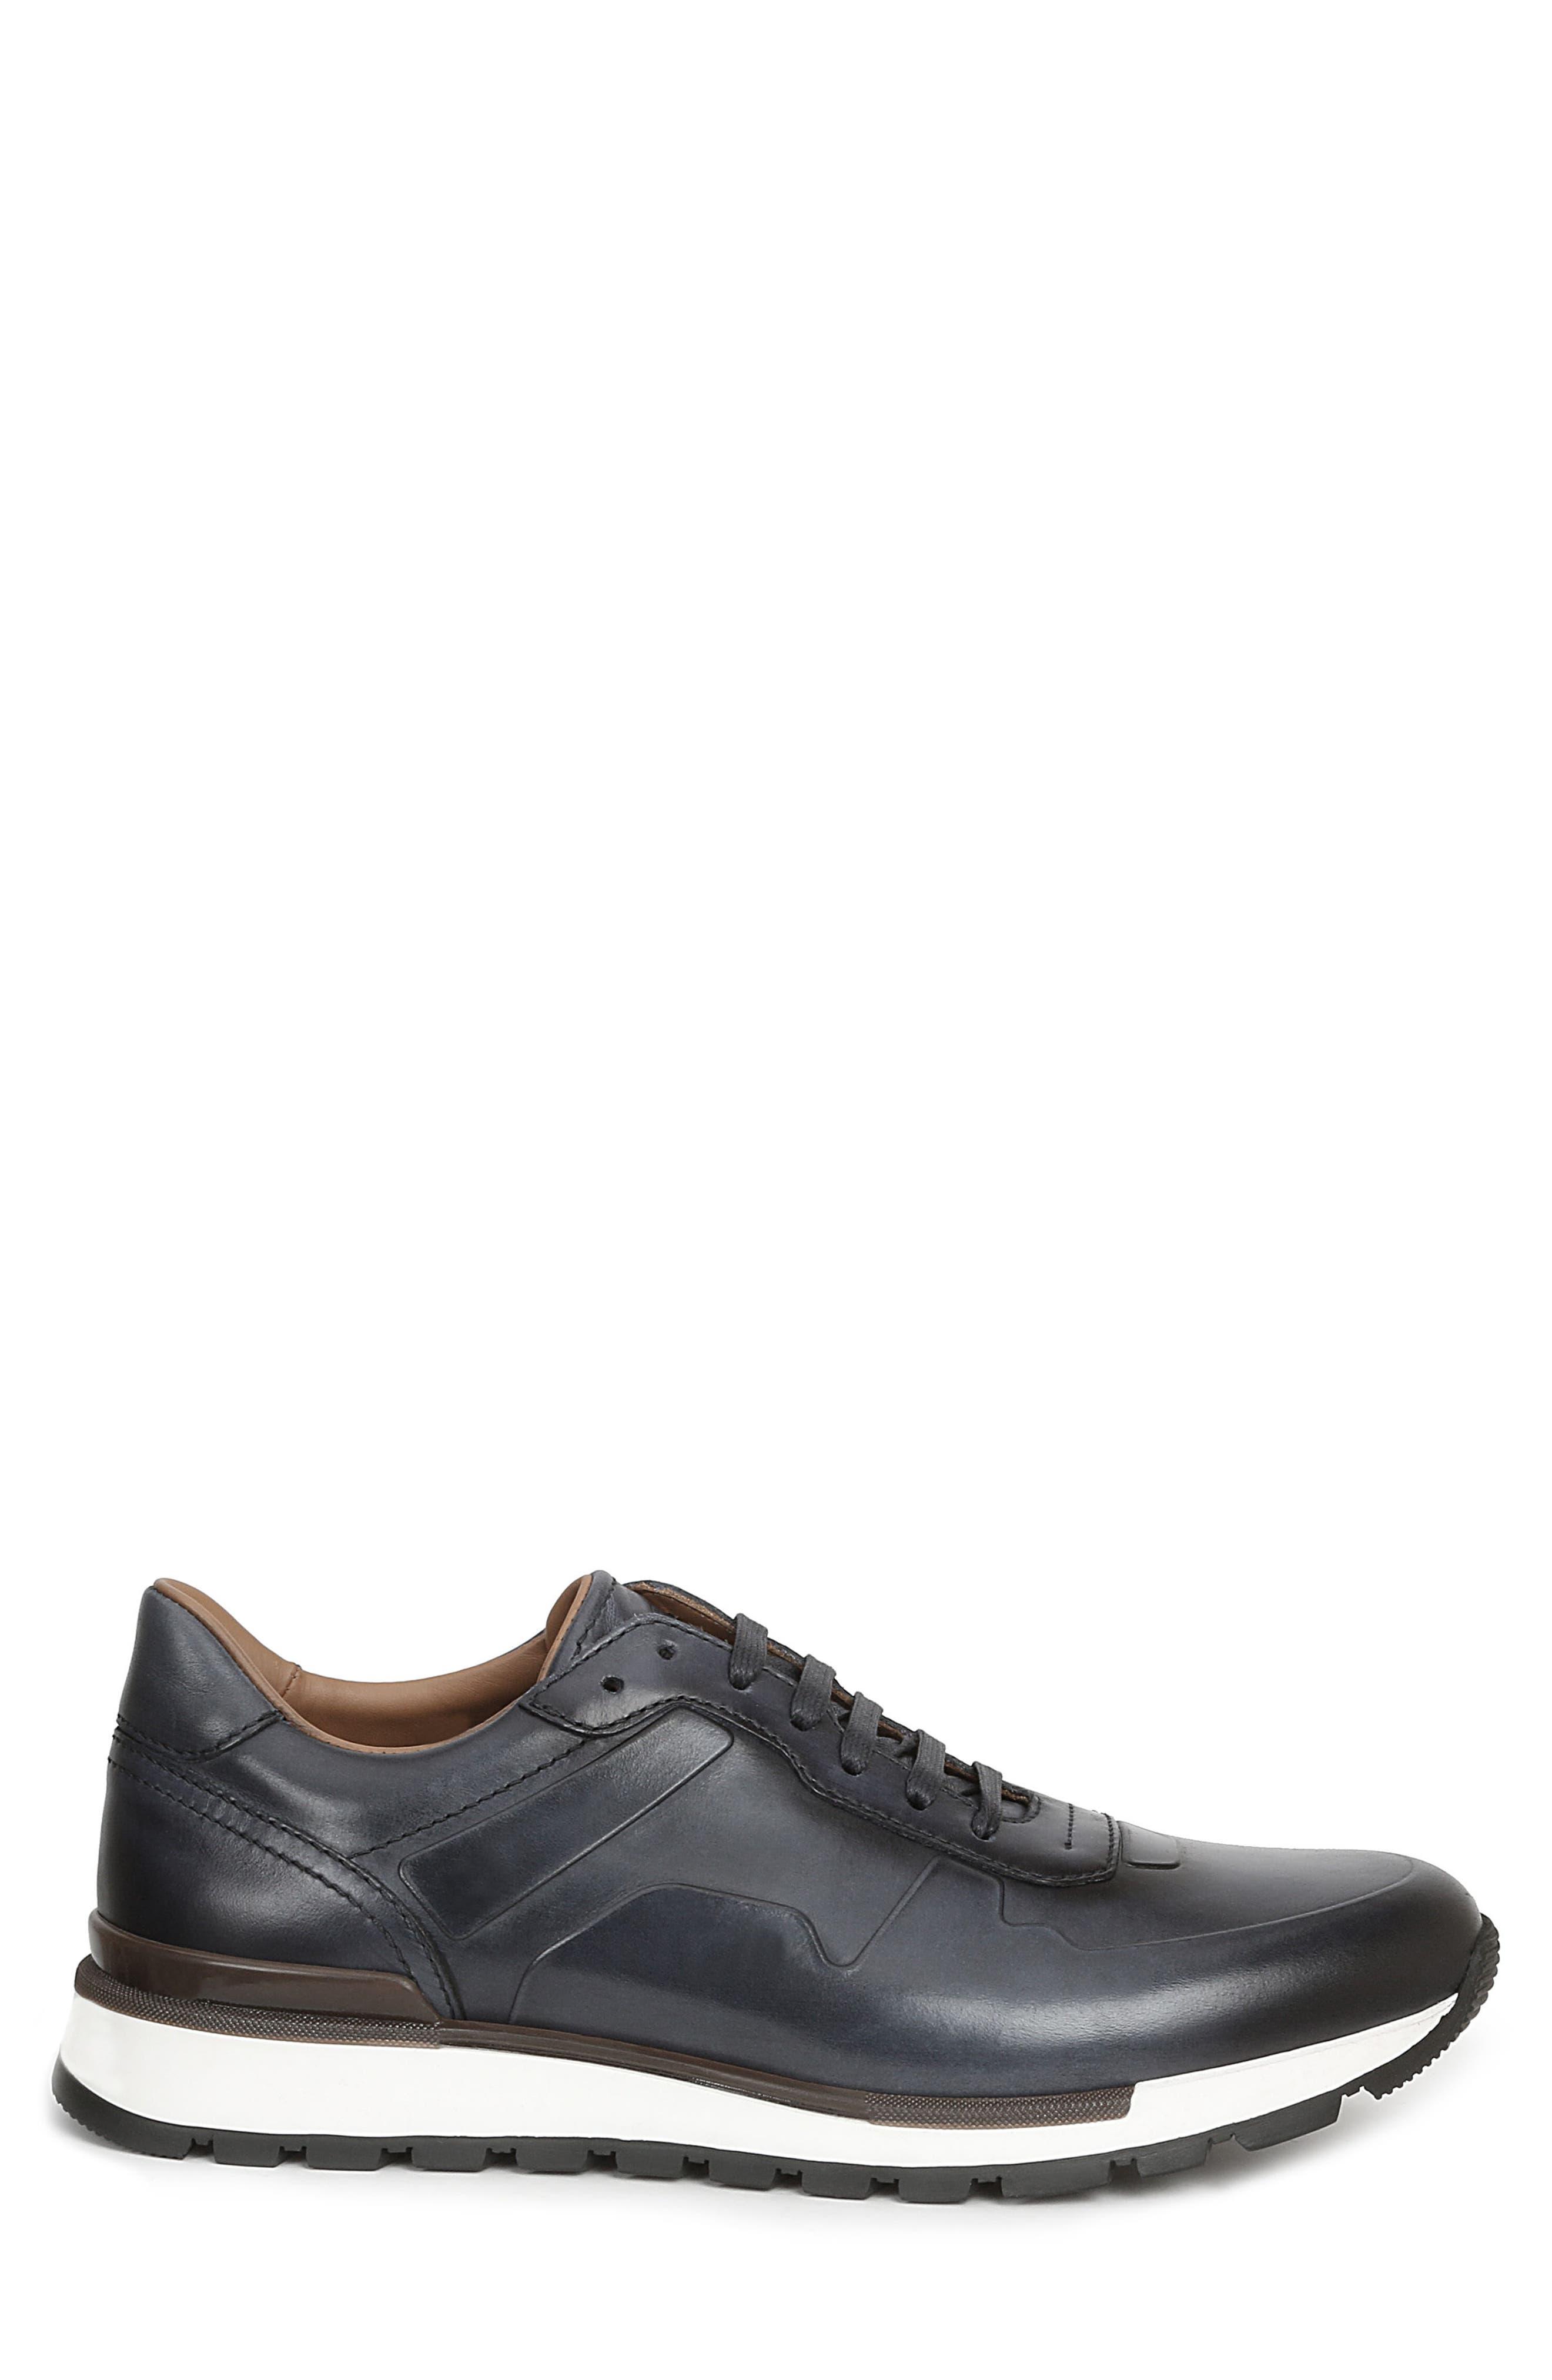 Davio Low Top Sneaker,                             Alternate thumbnail 3, color,                             NAVY